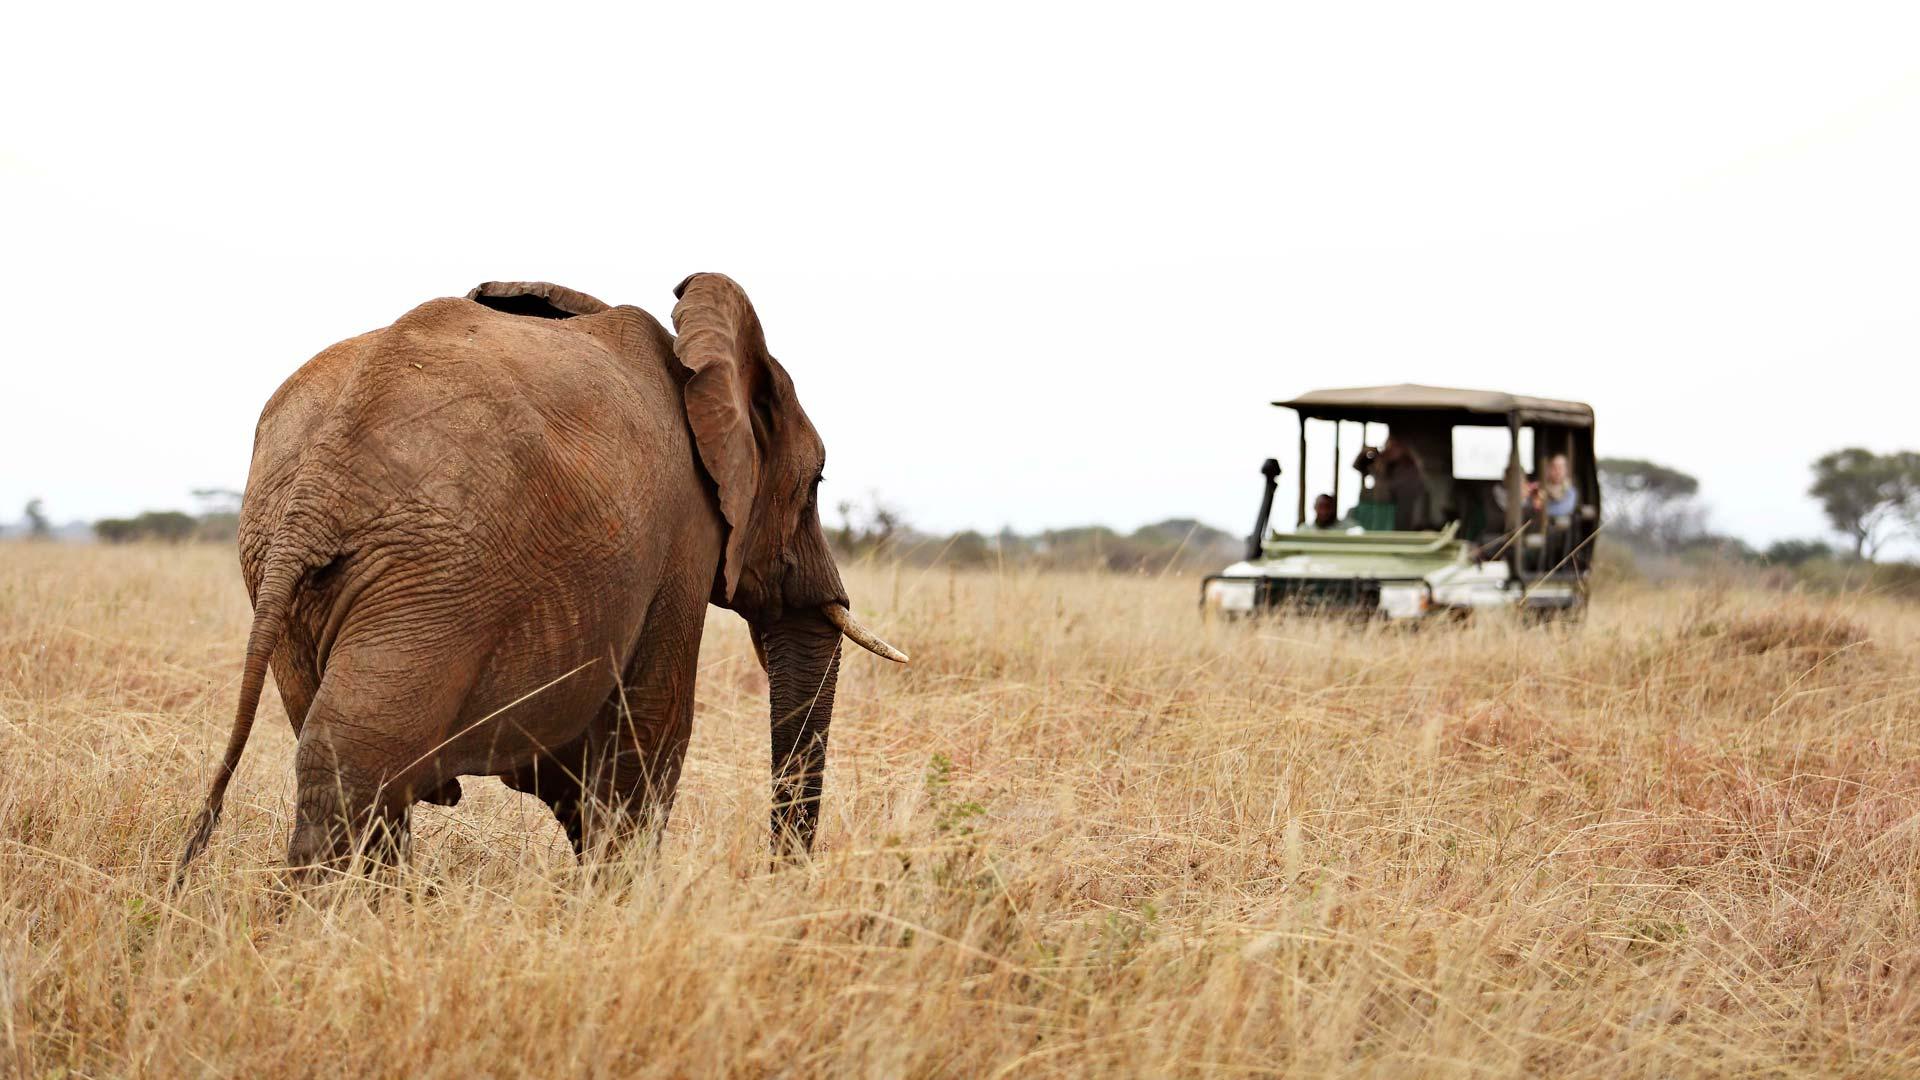 Elephant approaching car